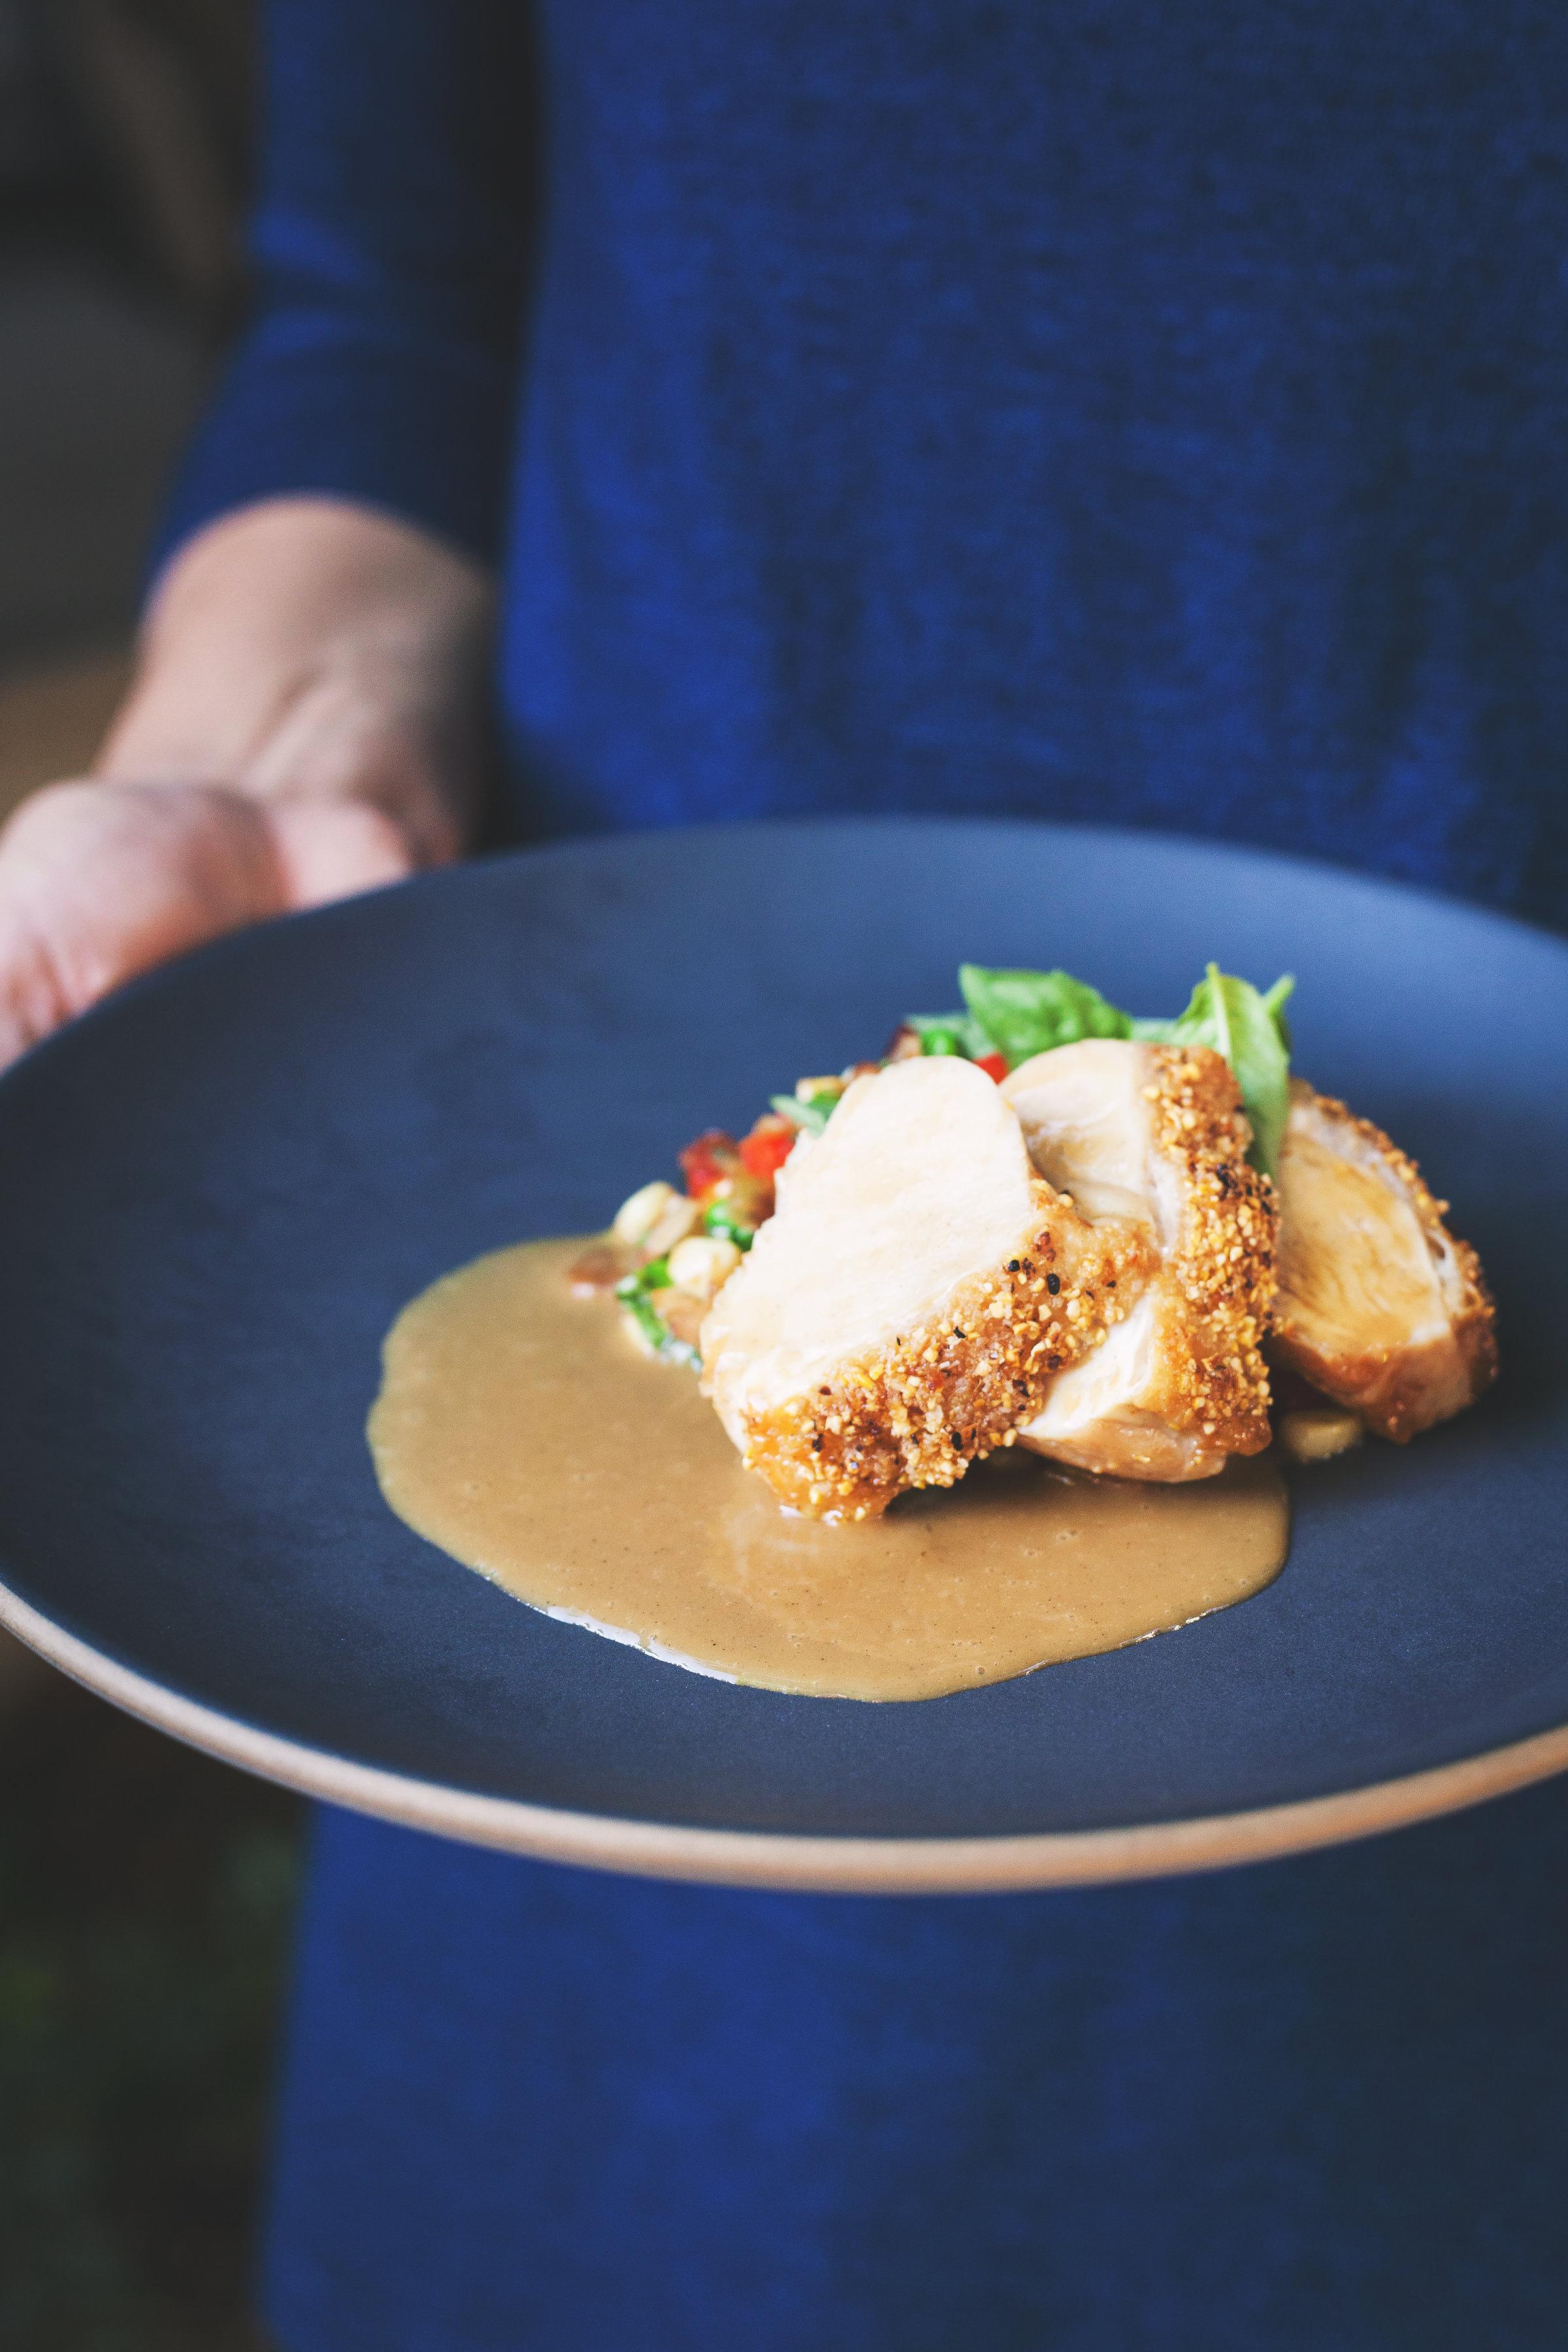 Cornmeal crusted chicken recipe